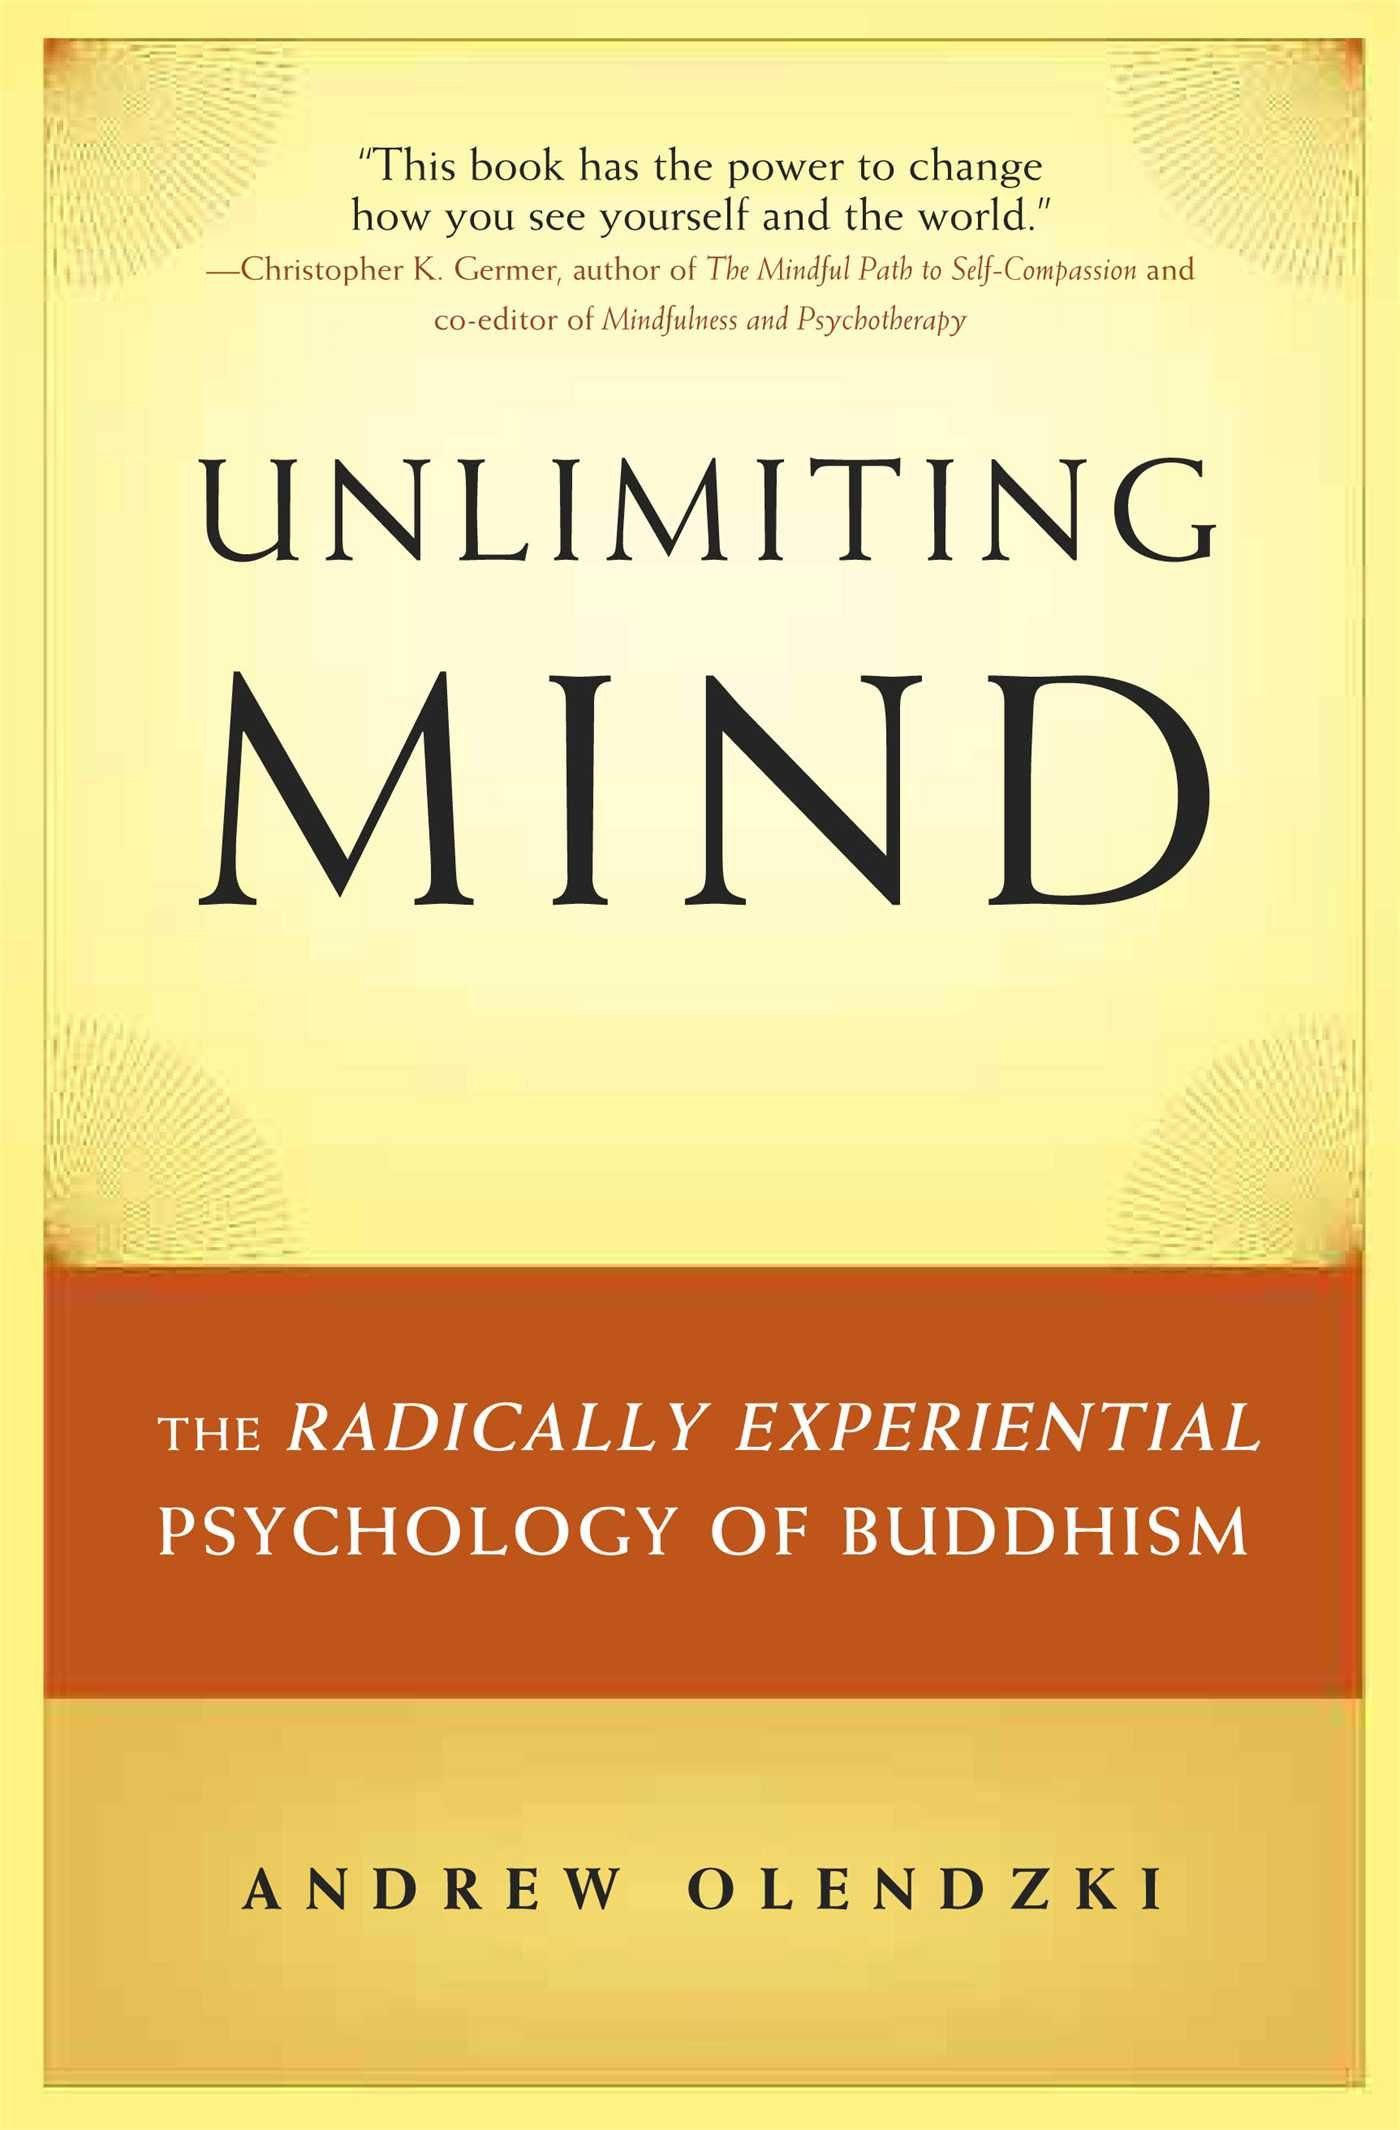 Olendzki Unlimiting Mind cover art